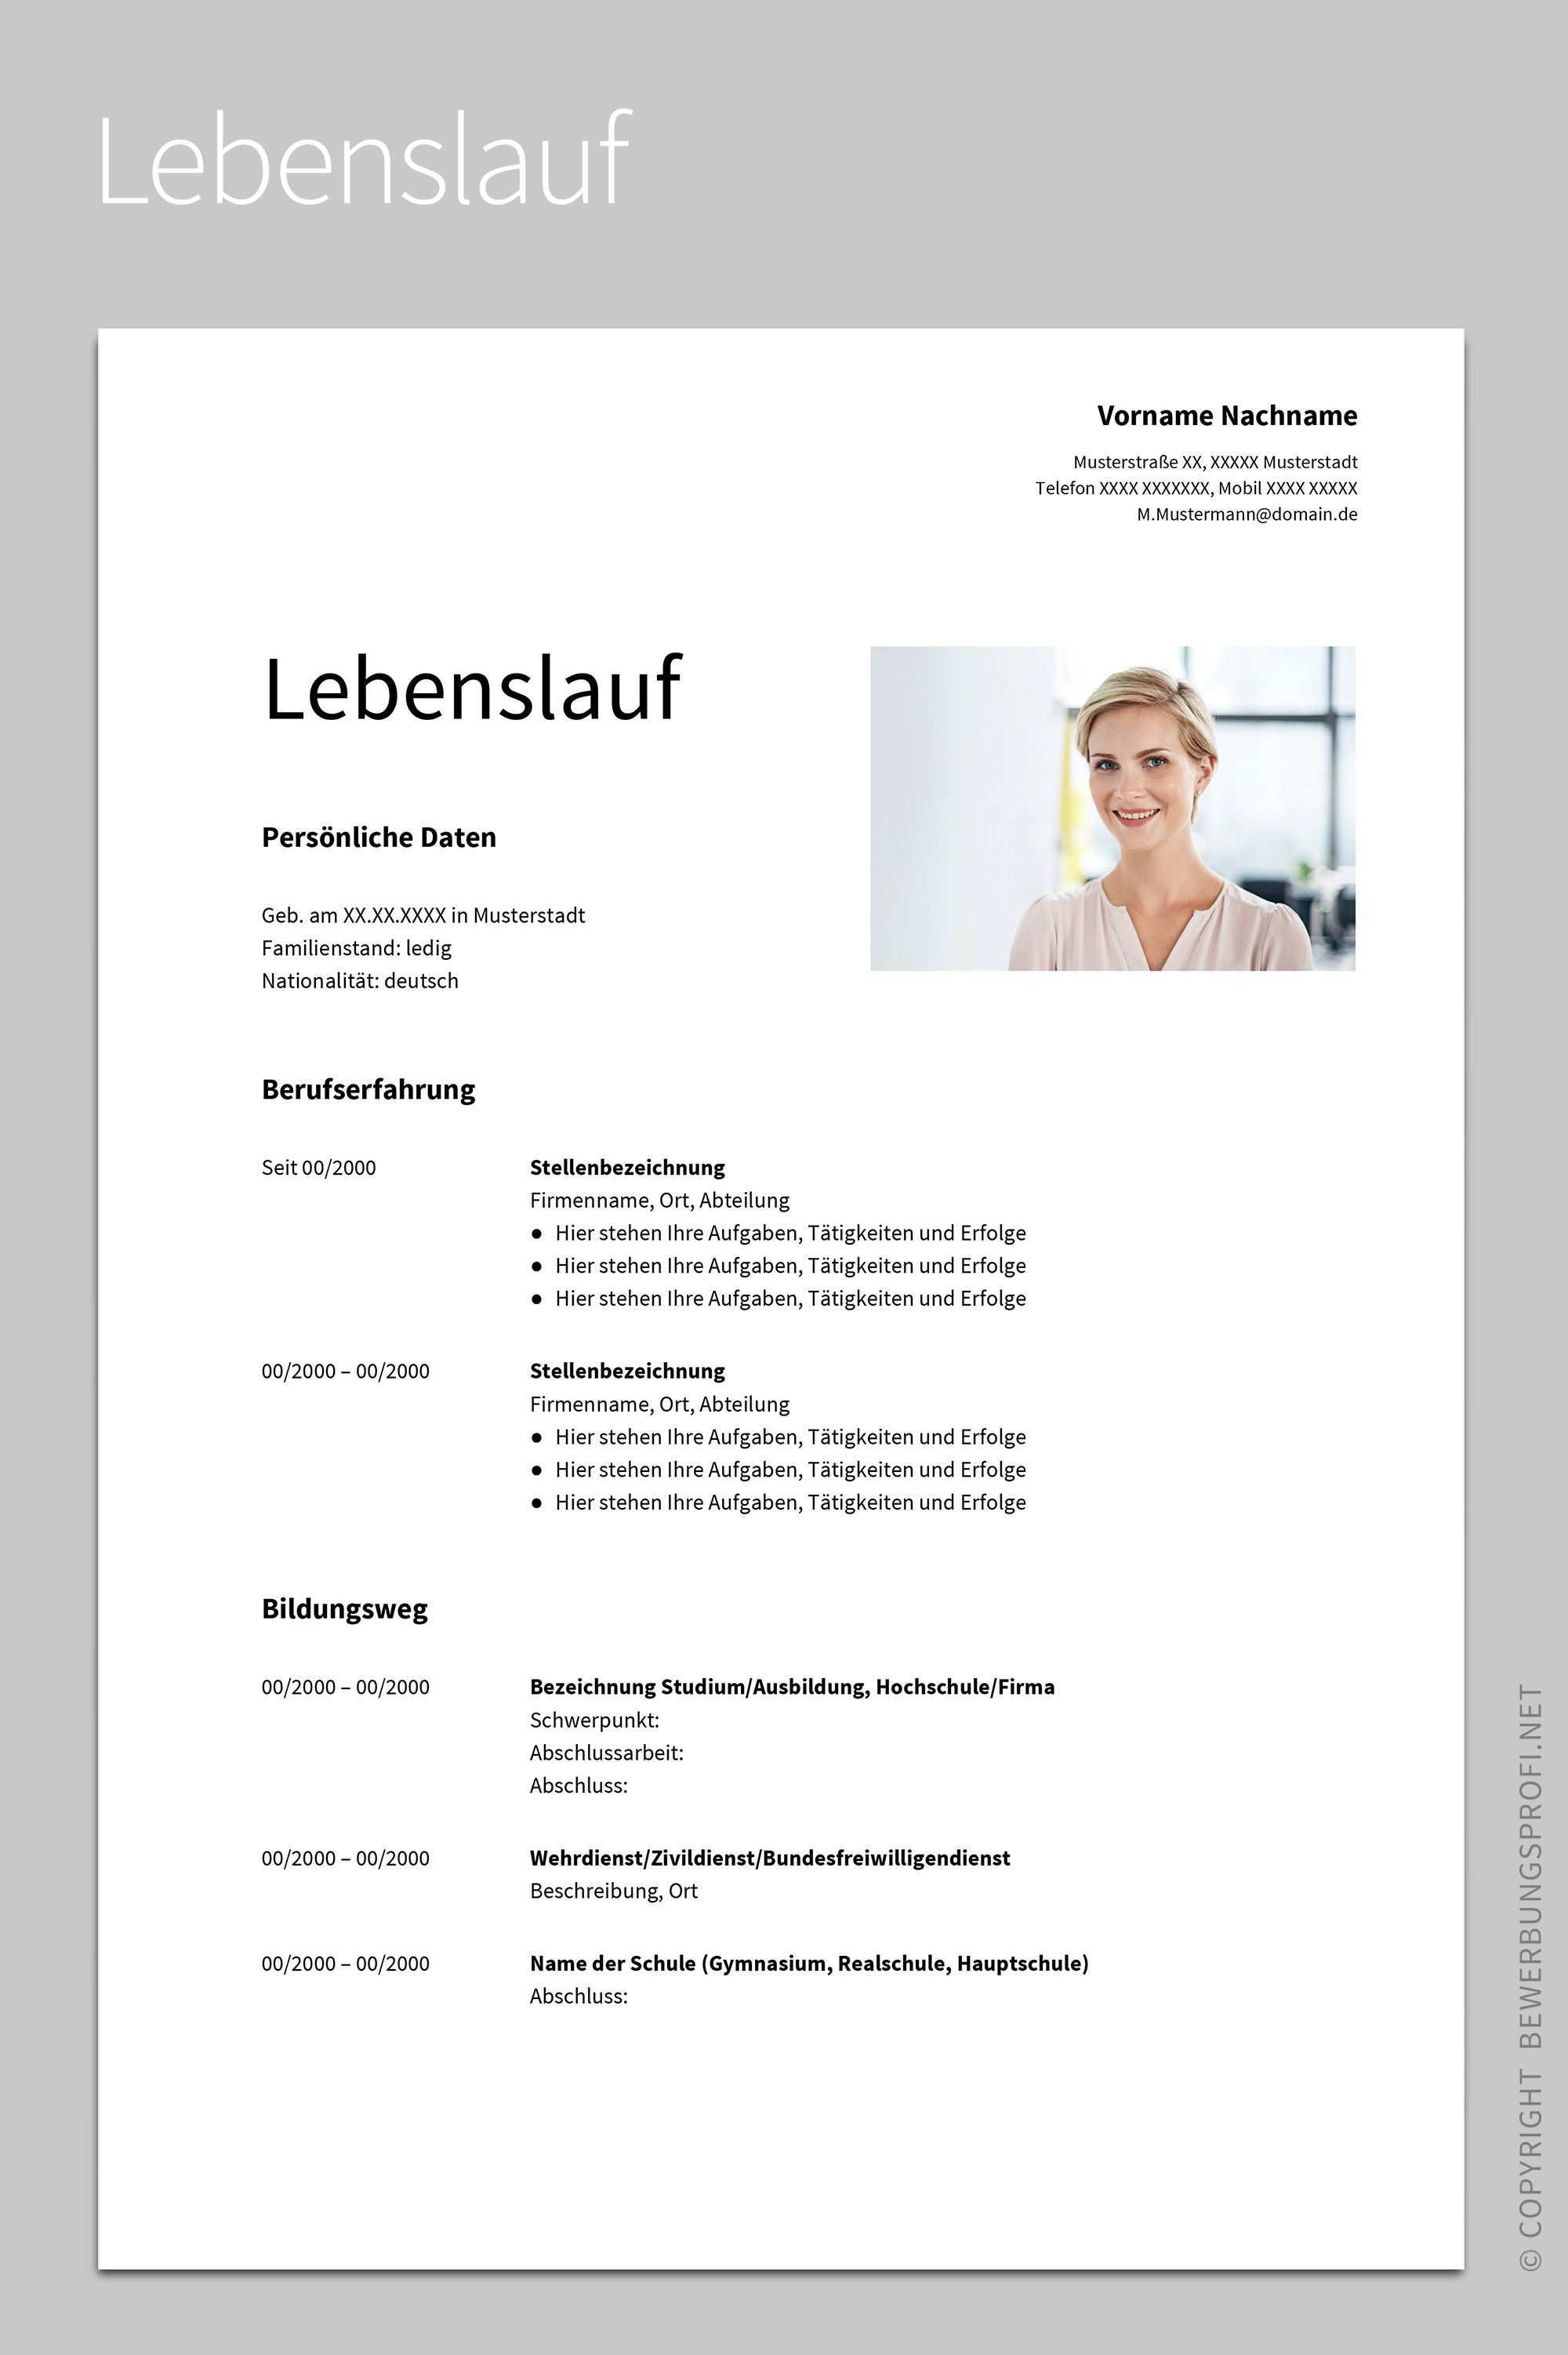 30 Lebenslauf Design Vorlage Download Lebenslauf Lebenslauf Design Lebenslauf Design Vorlage